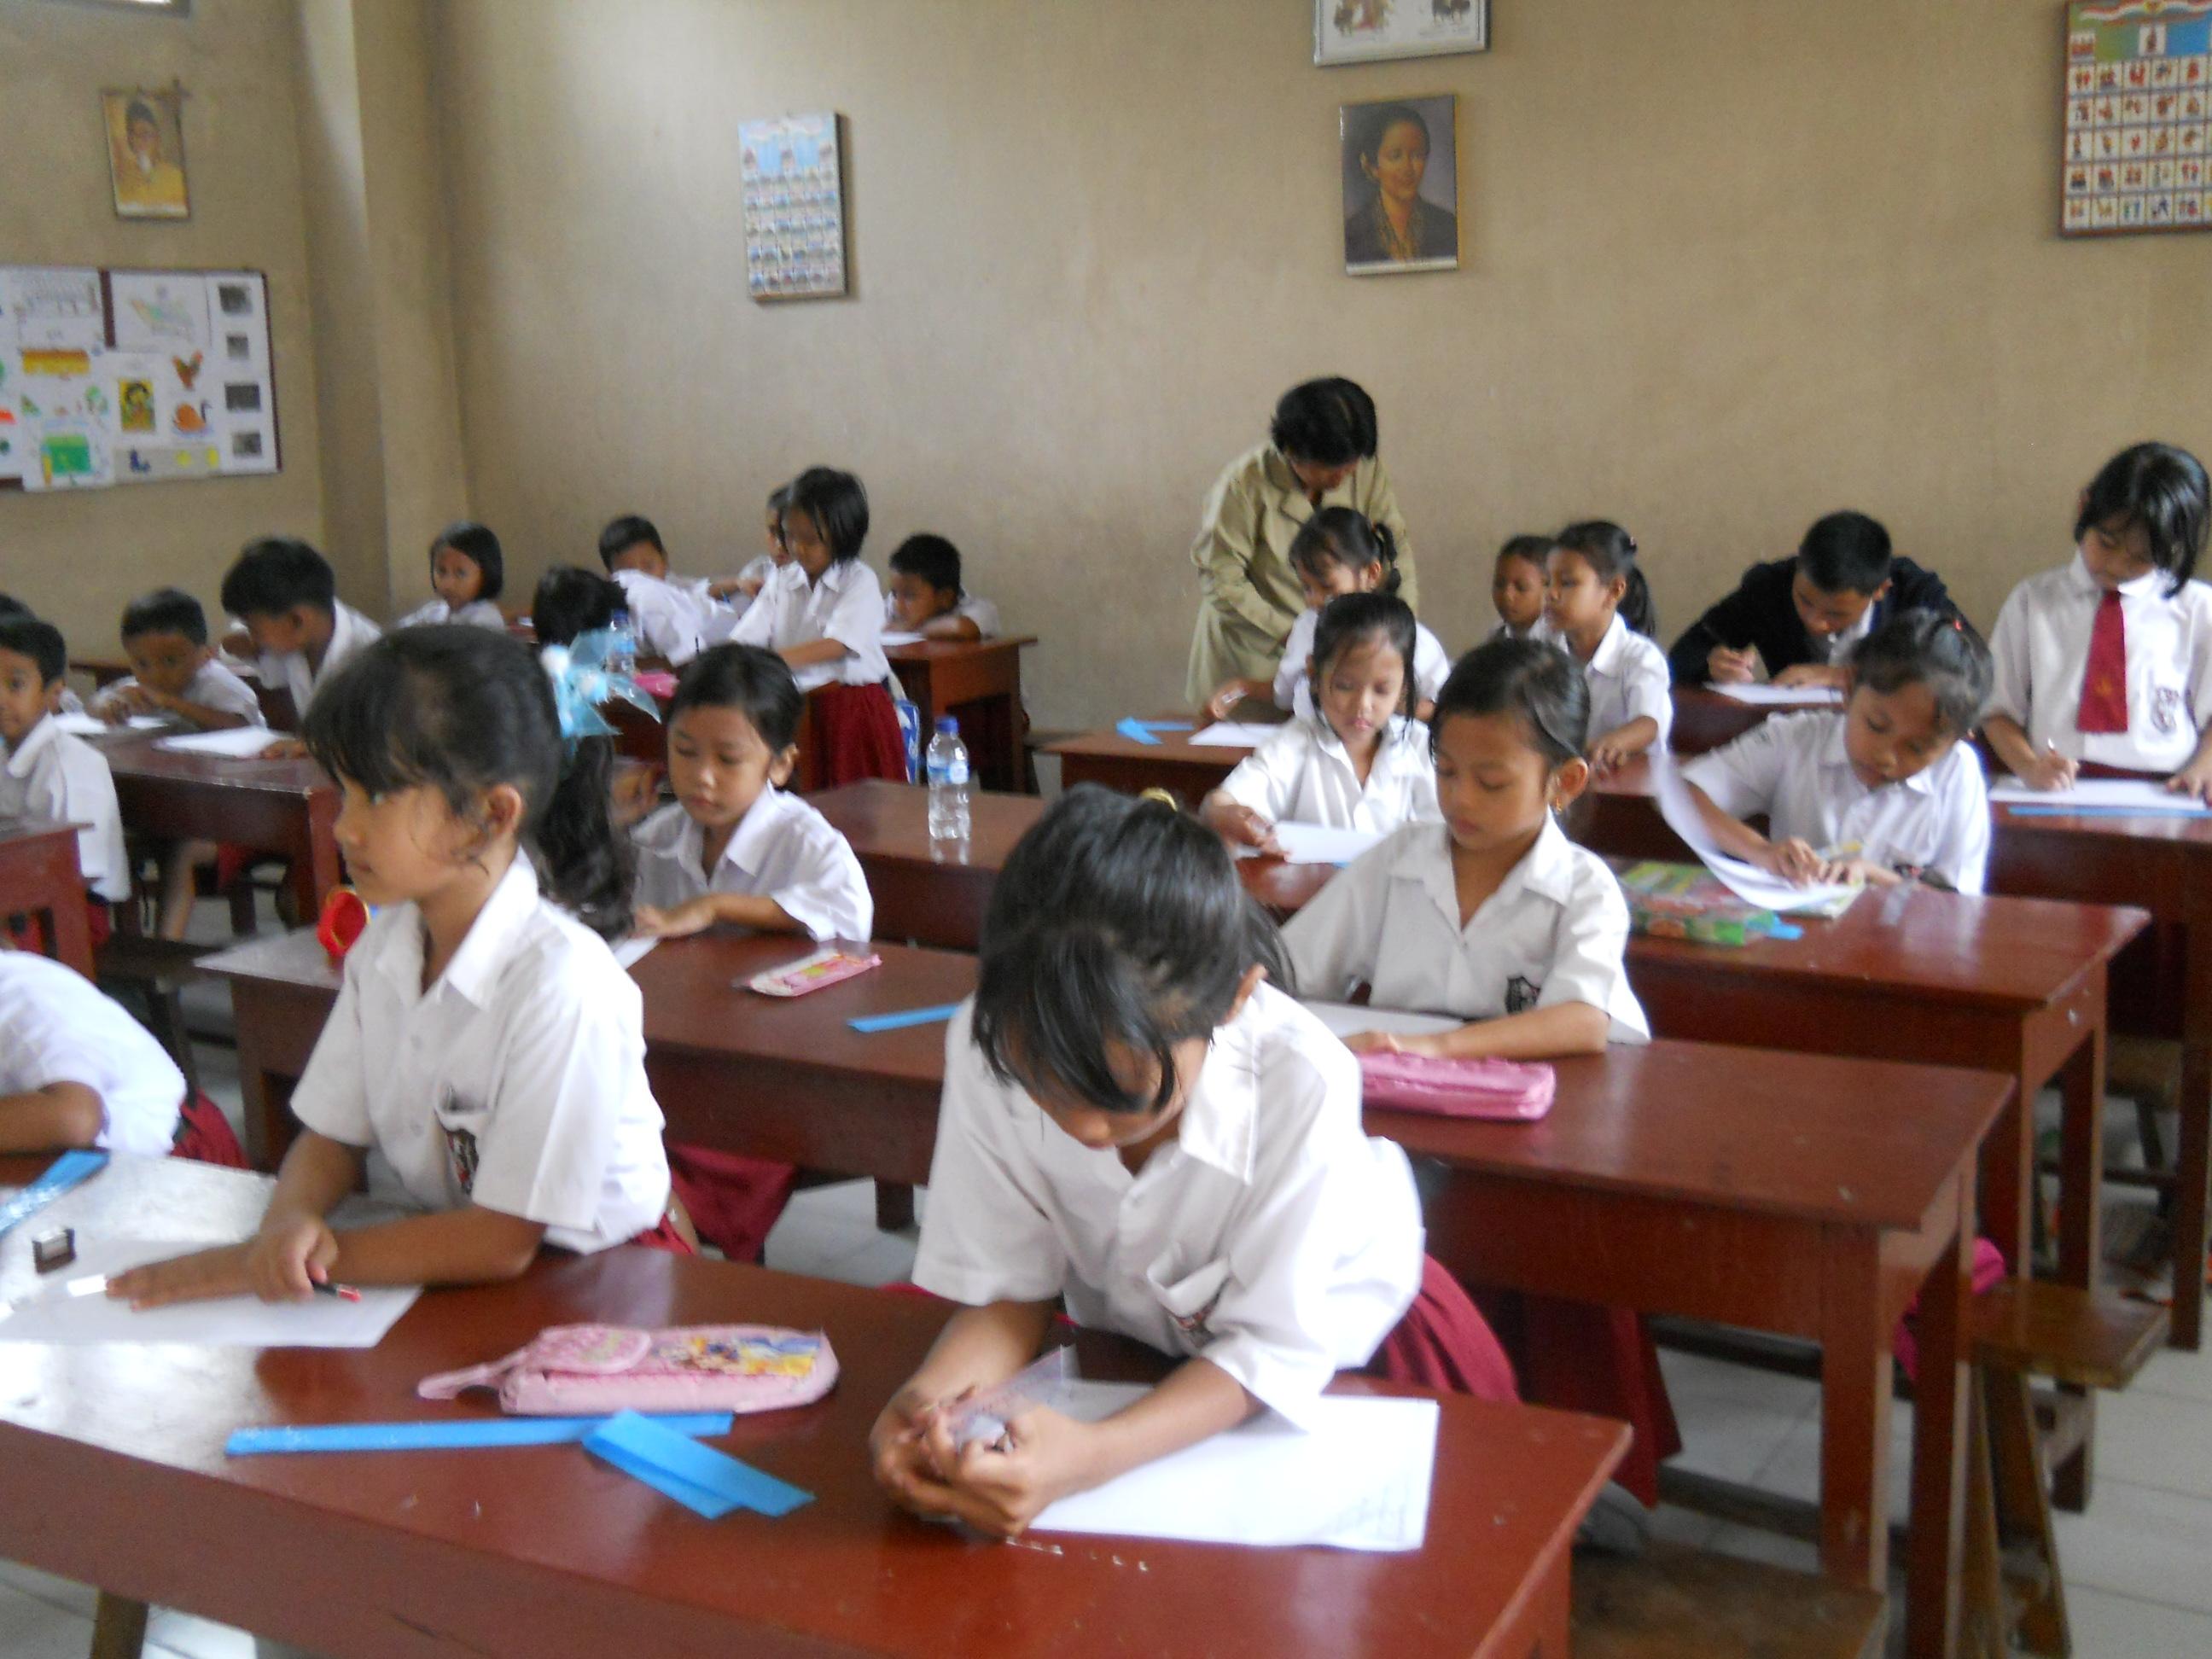 Contoh Program Media Pembelajaran Anak Sd Kumpulan Skripsi Model Pembelajaran Ips Contoh Skripsi 2015 Anak Anak Sd